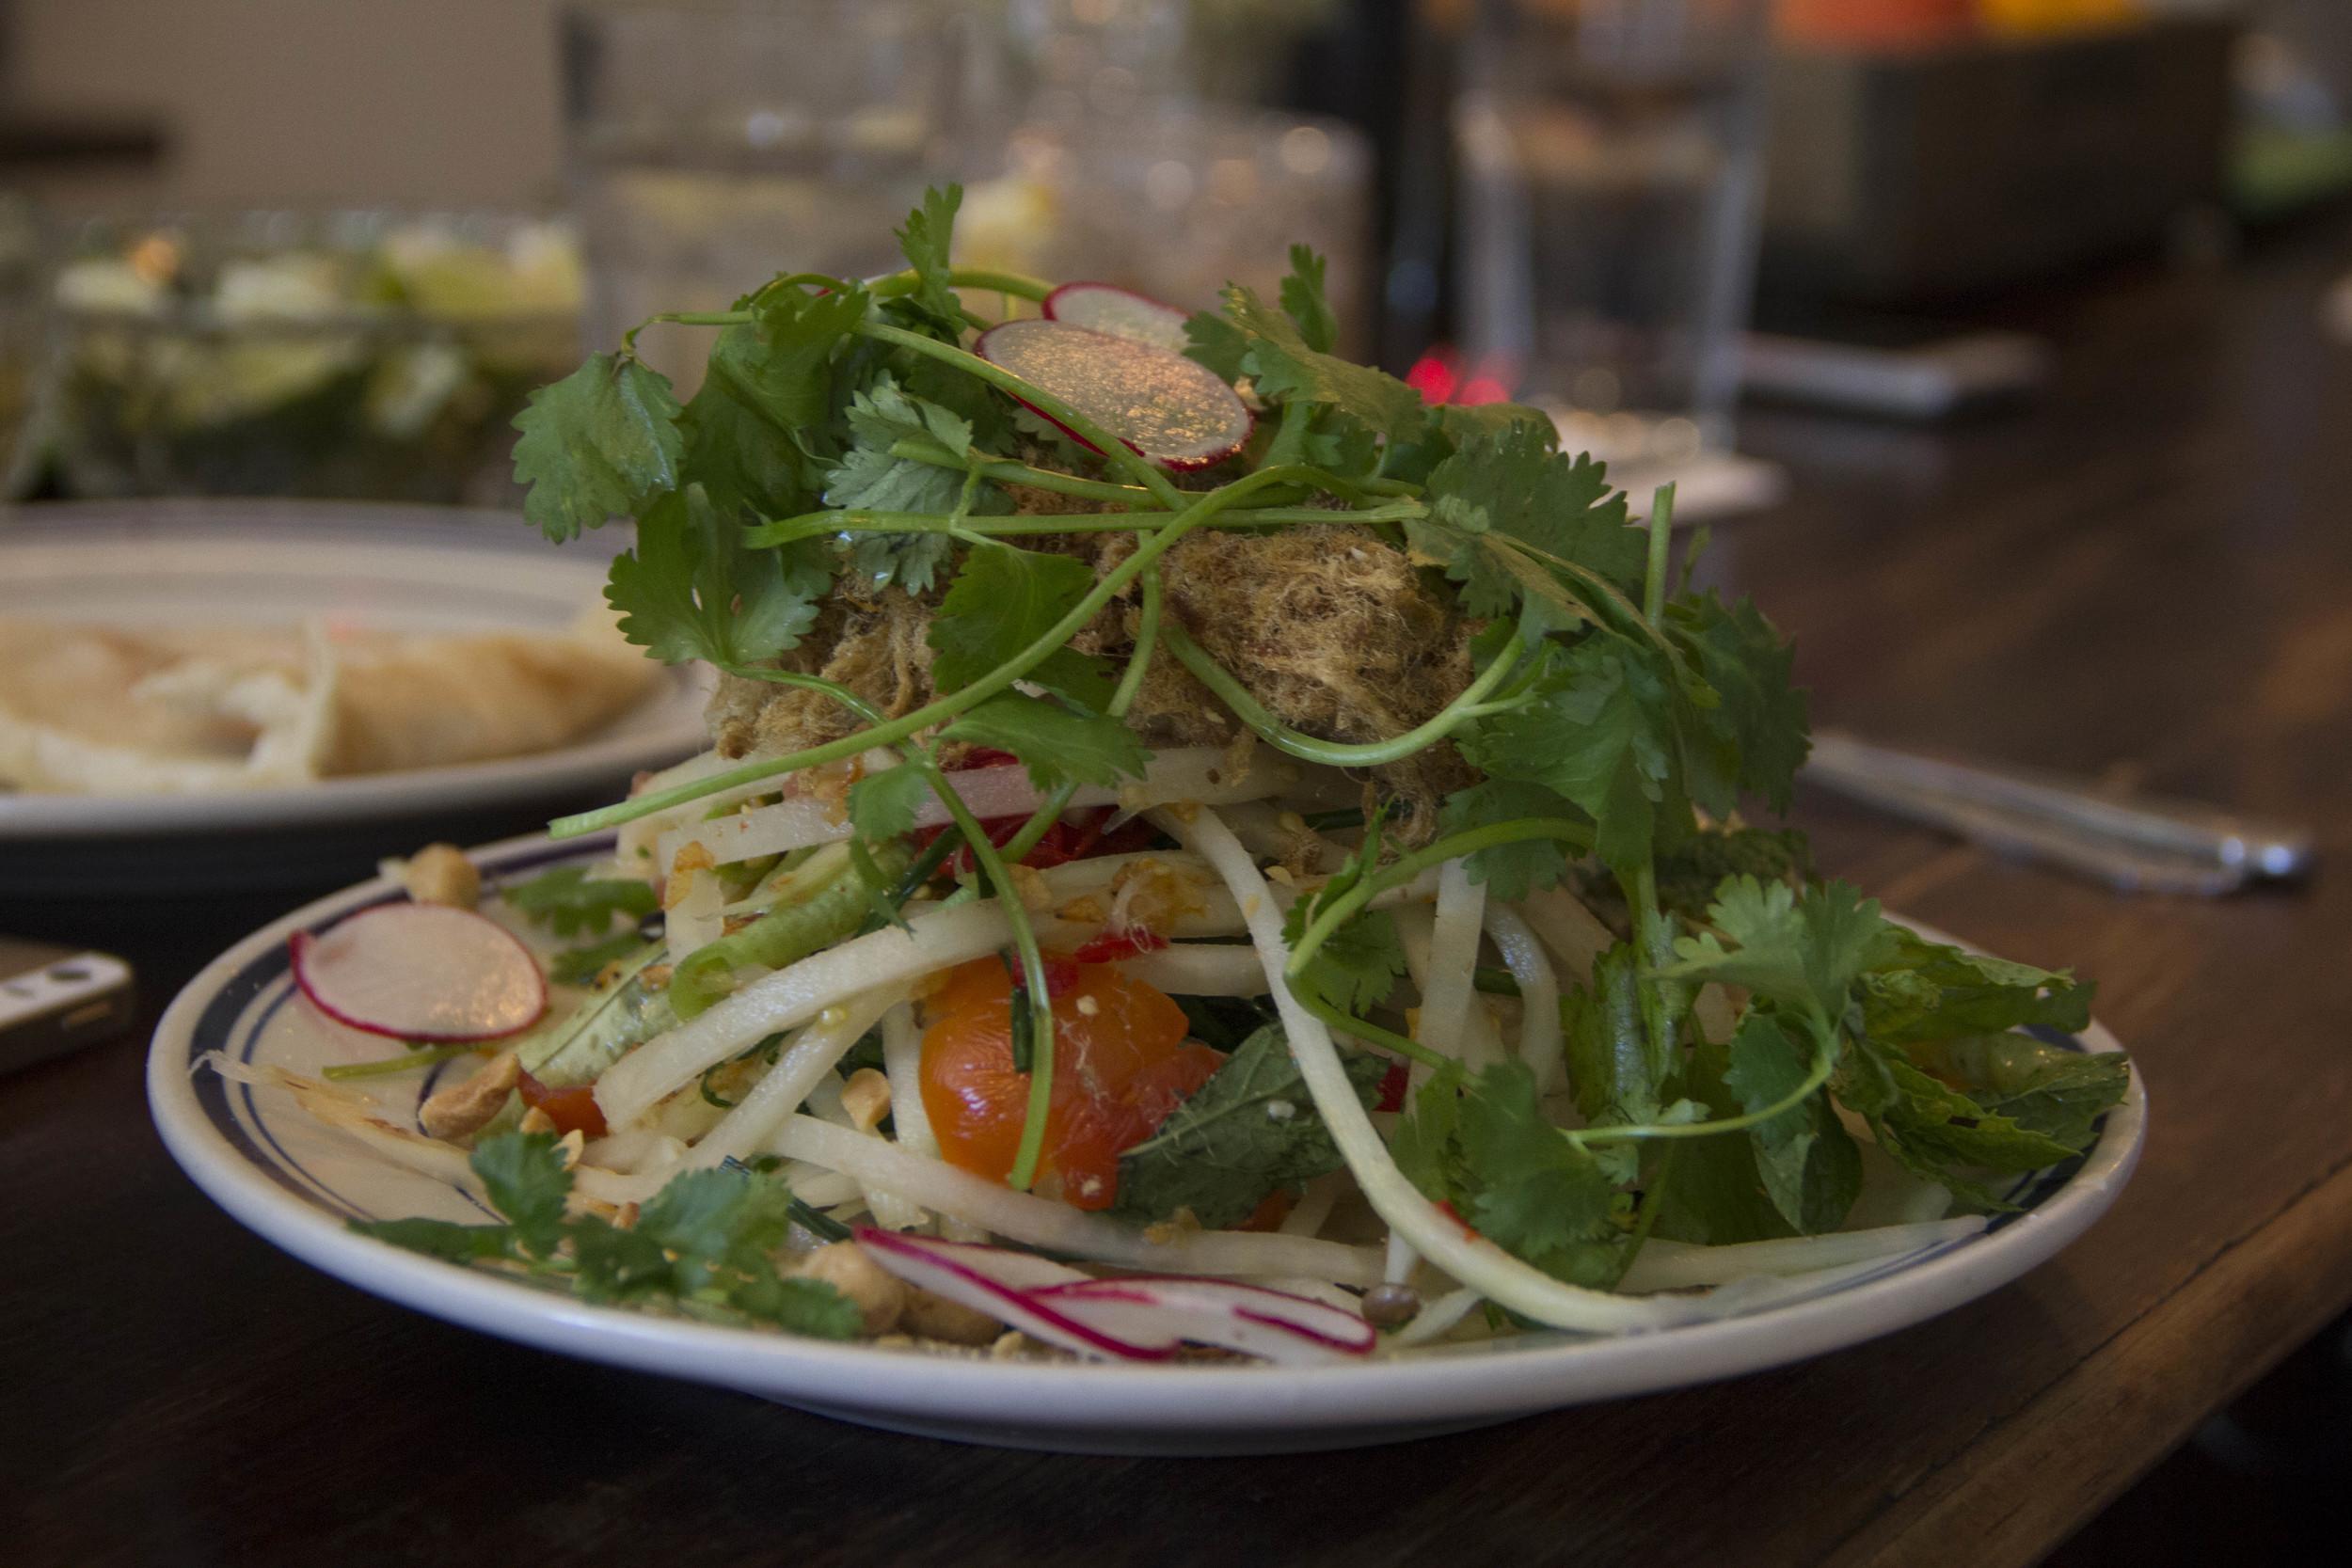 Green papaya salad with radishes, cilantro,